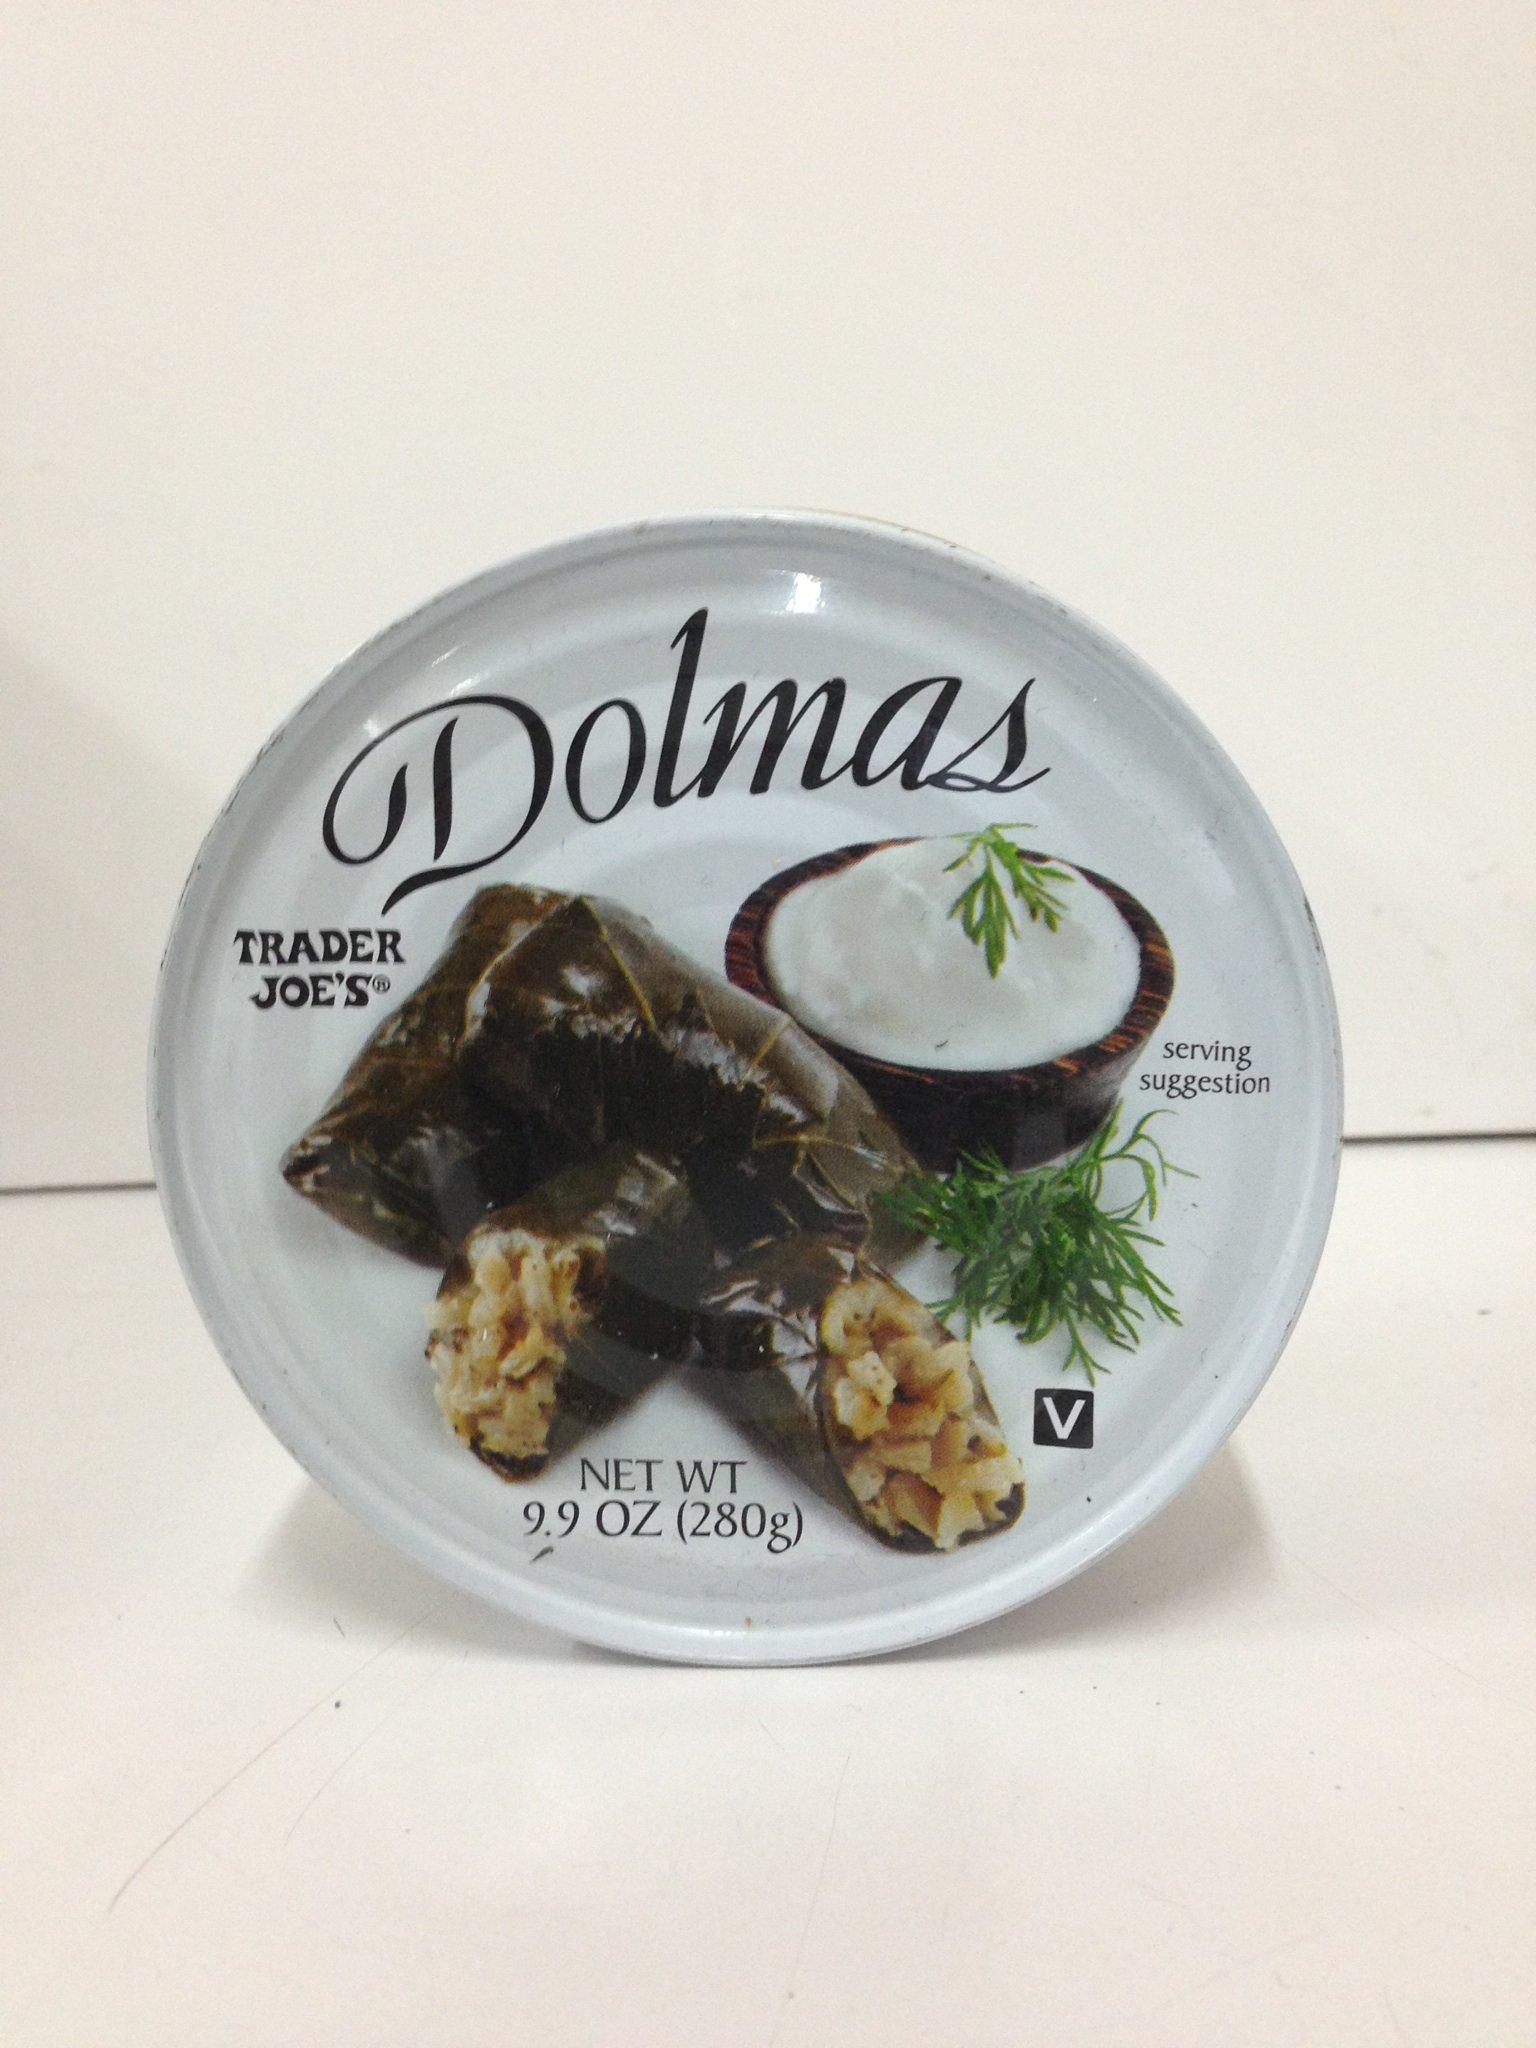 Trader Joe's Dolmas Vine Leaves Stuffed with Rice (Pack of 6)